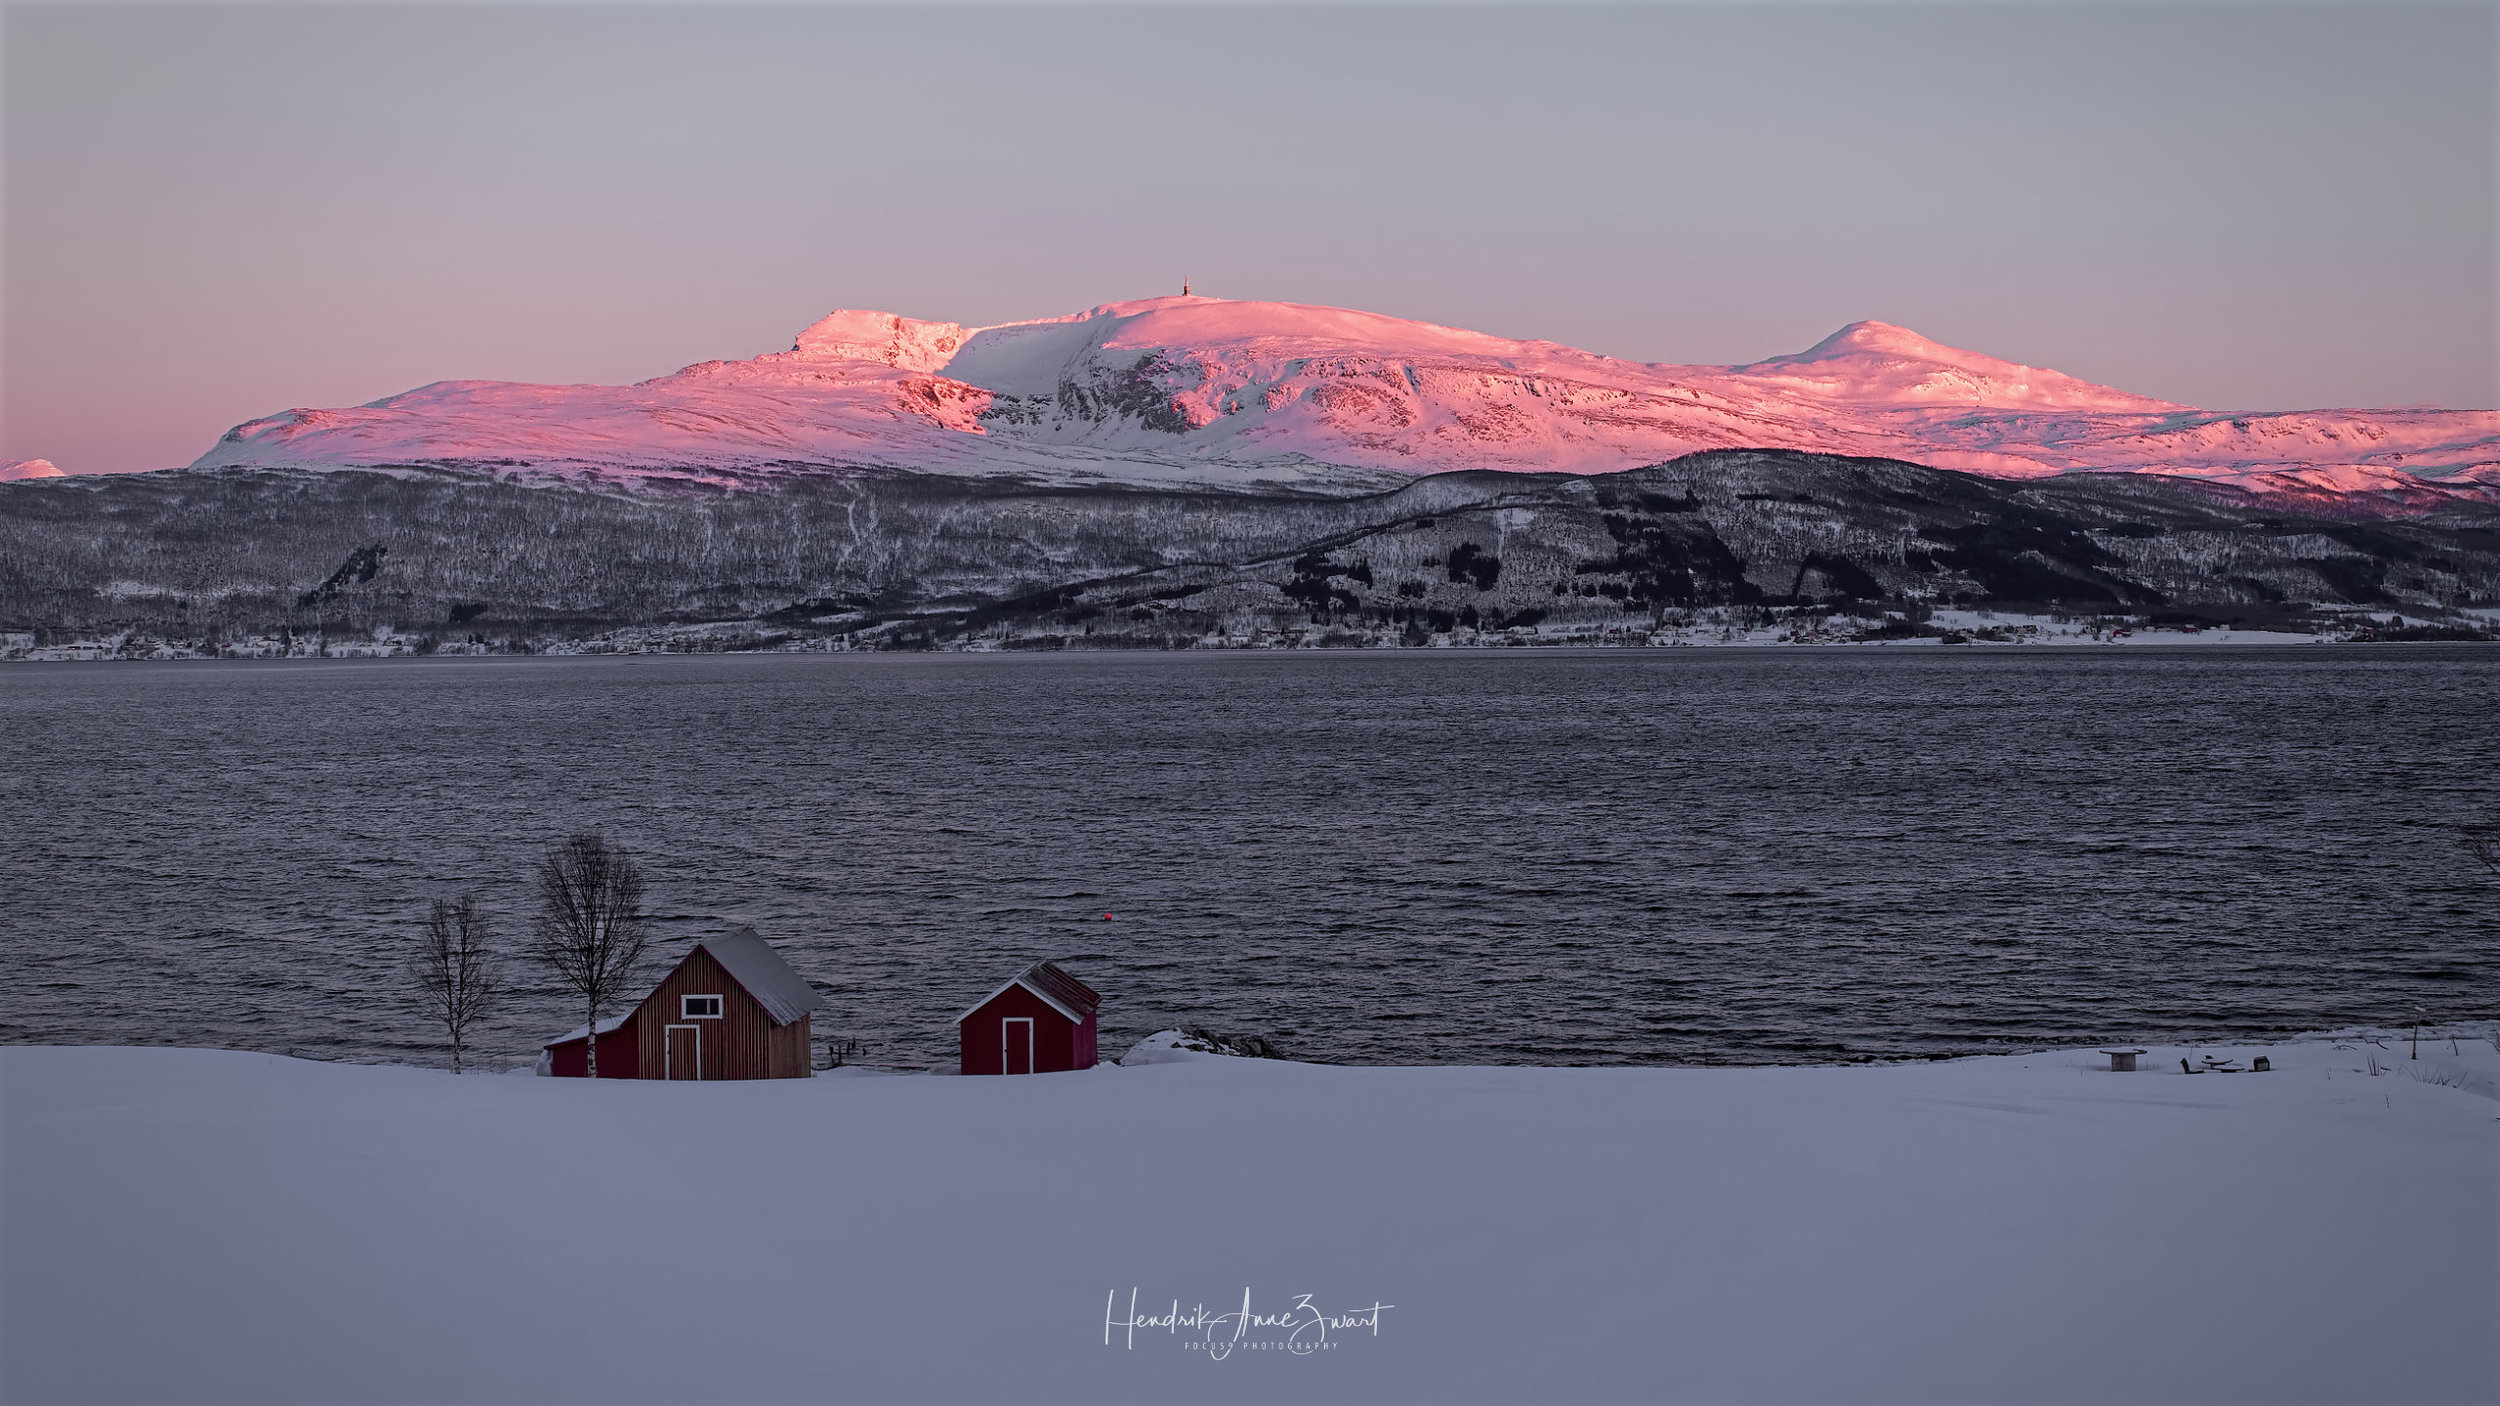 Gibo_Two_Housee_Norway_2.jpg